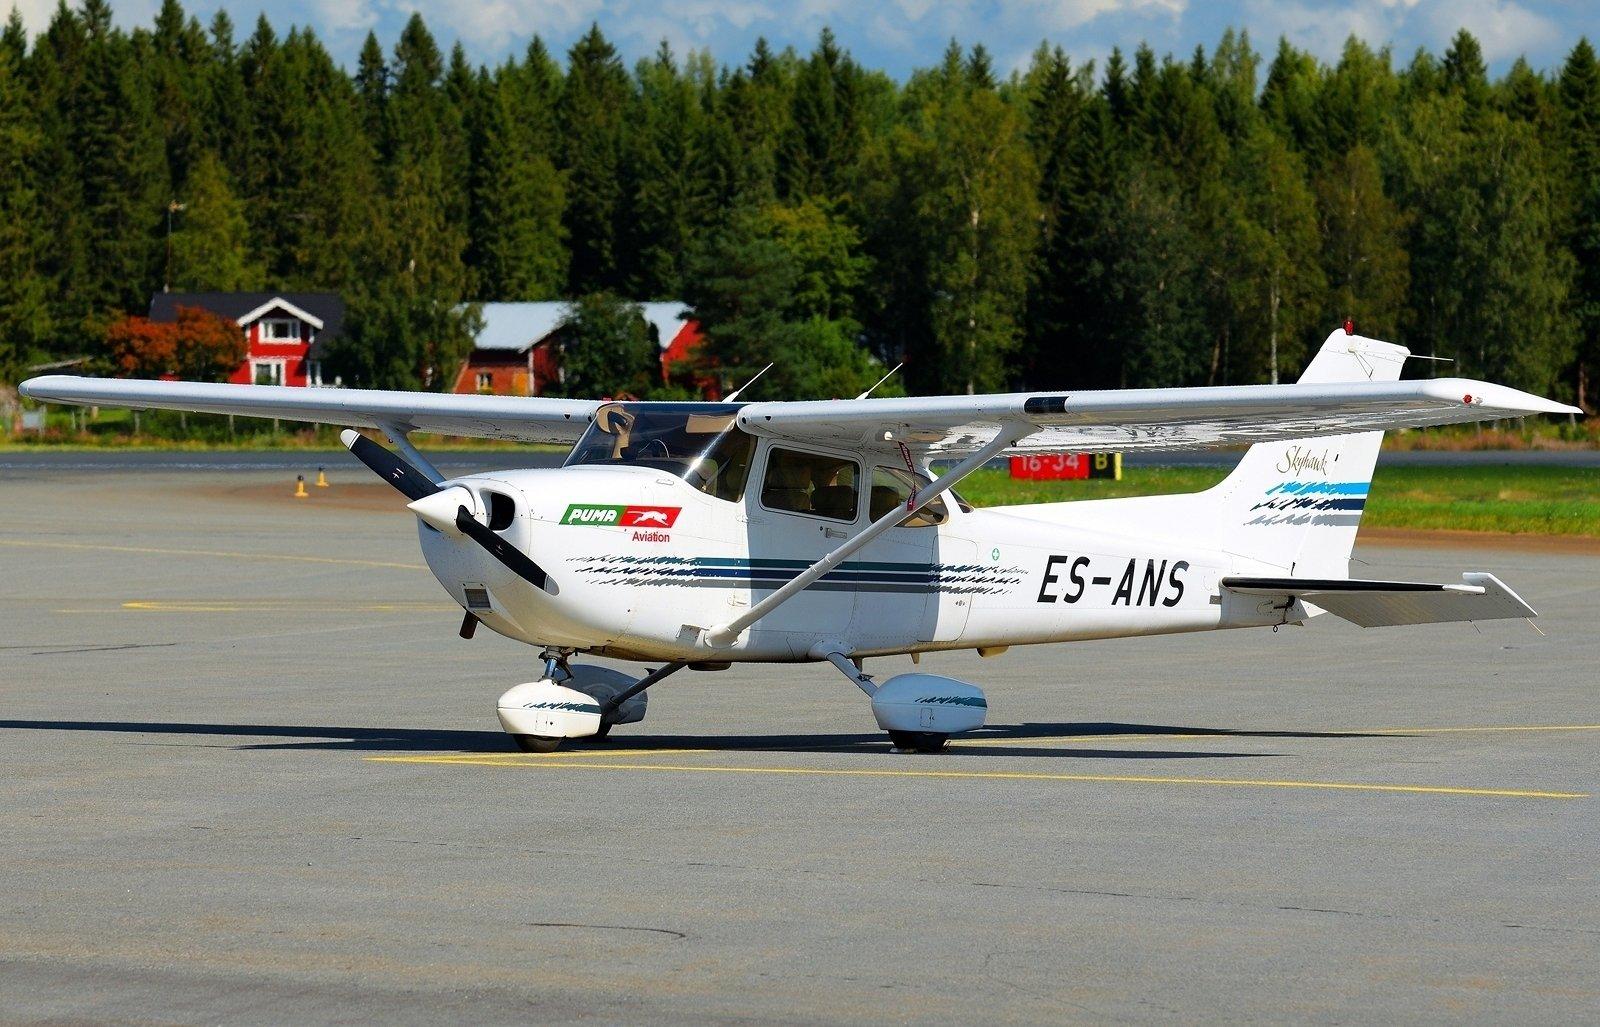 ES-ANS - Cessna 172R Skyhawk - 10.8.2020